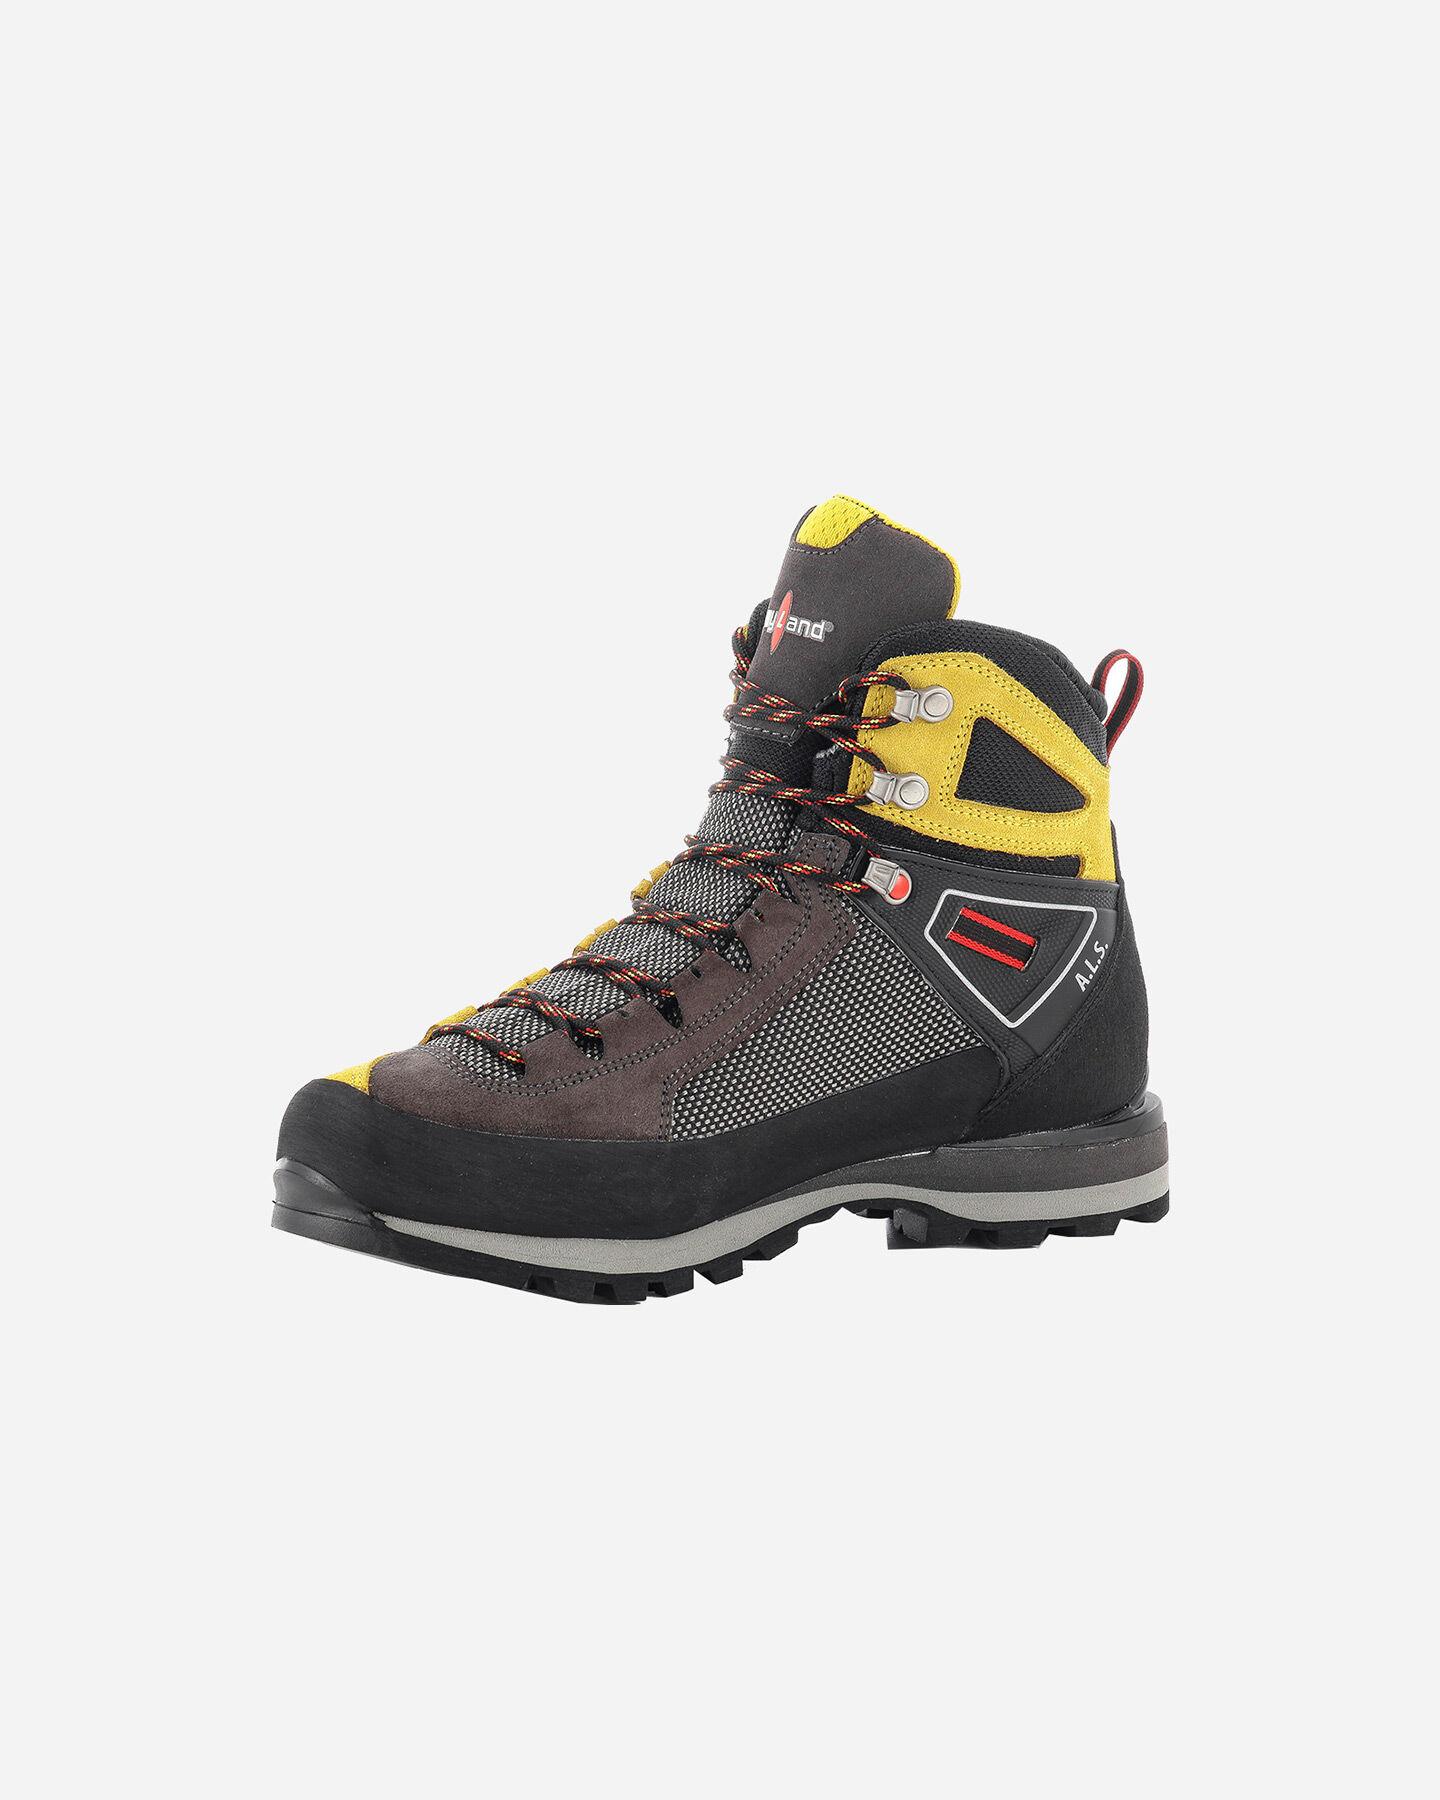 Scarpe alpinismo KAYLAND CROSS MOUNTAIN GTX M S4096136 scatto 3